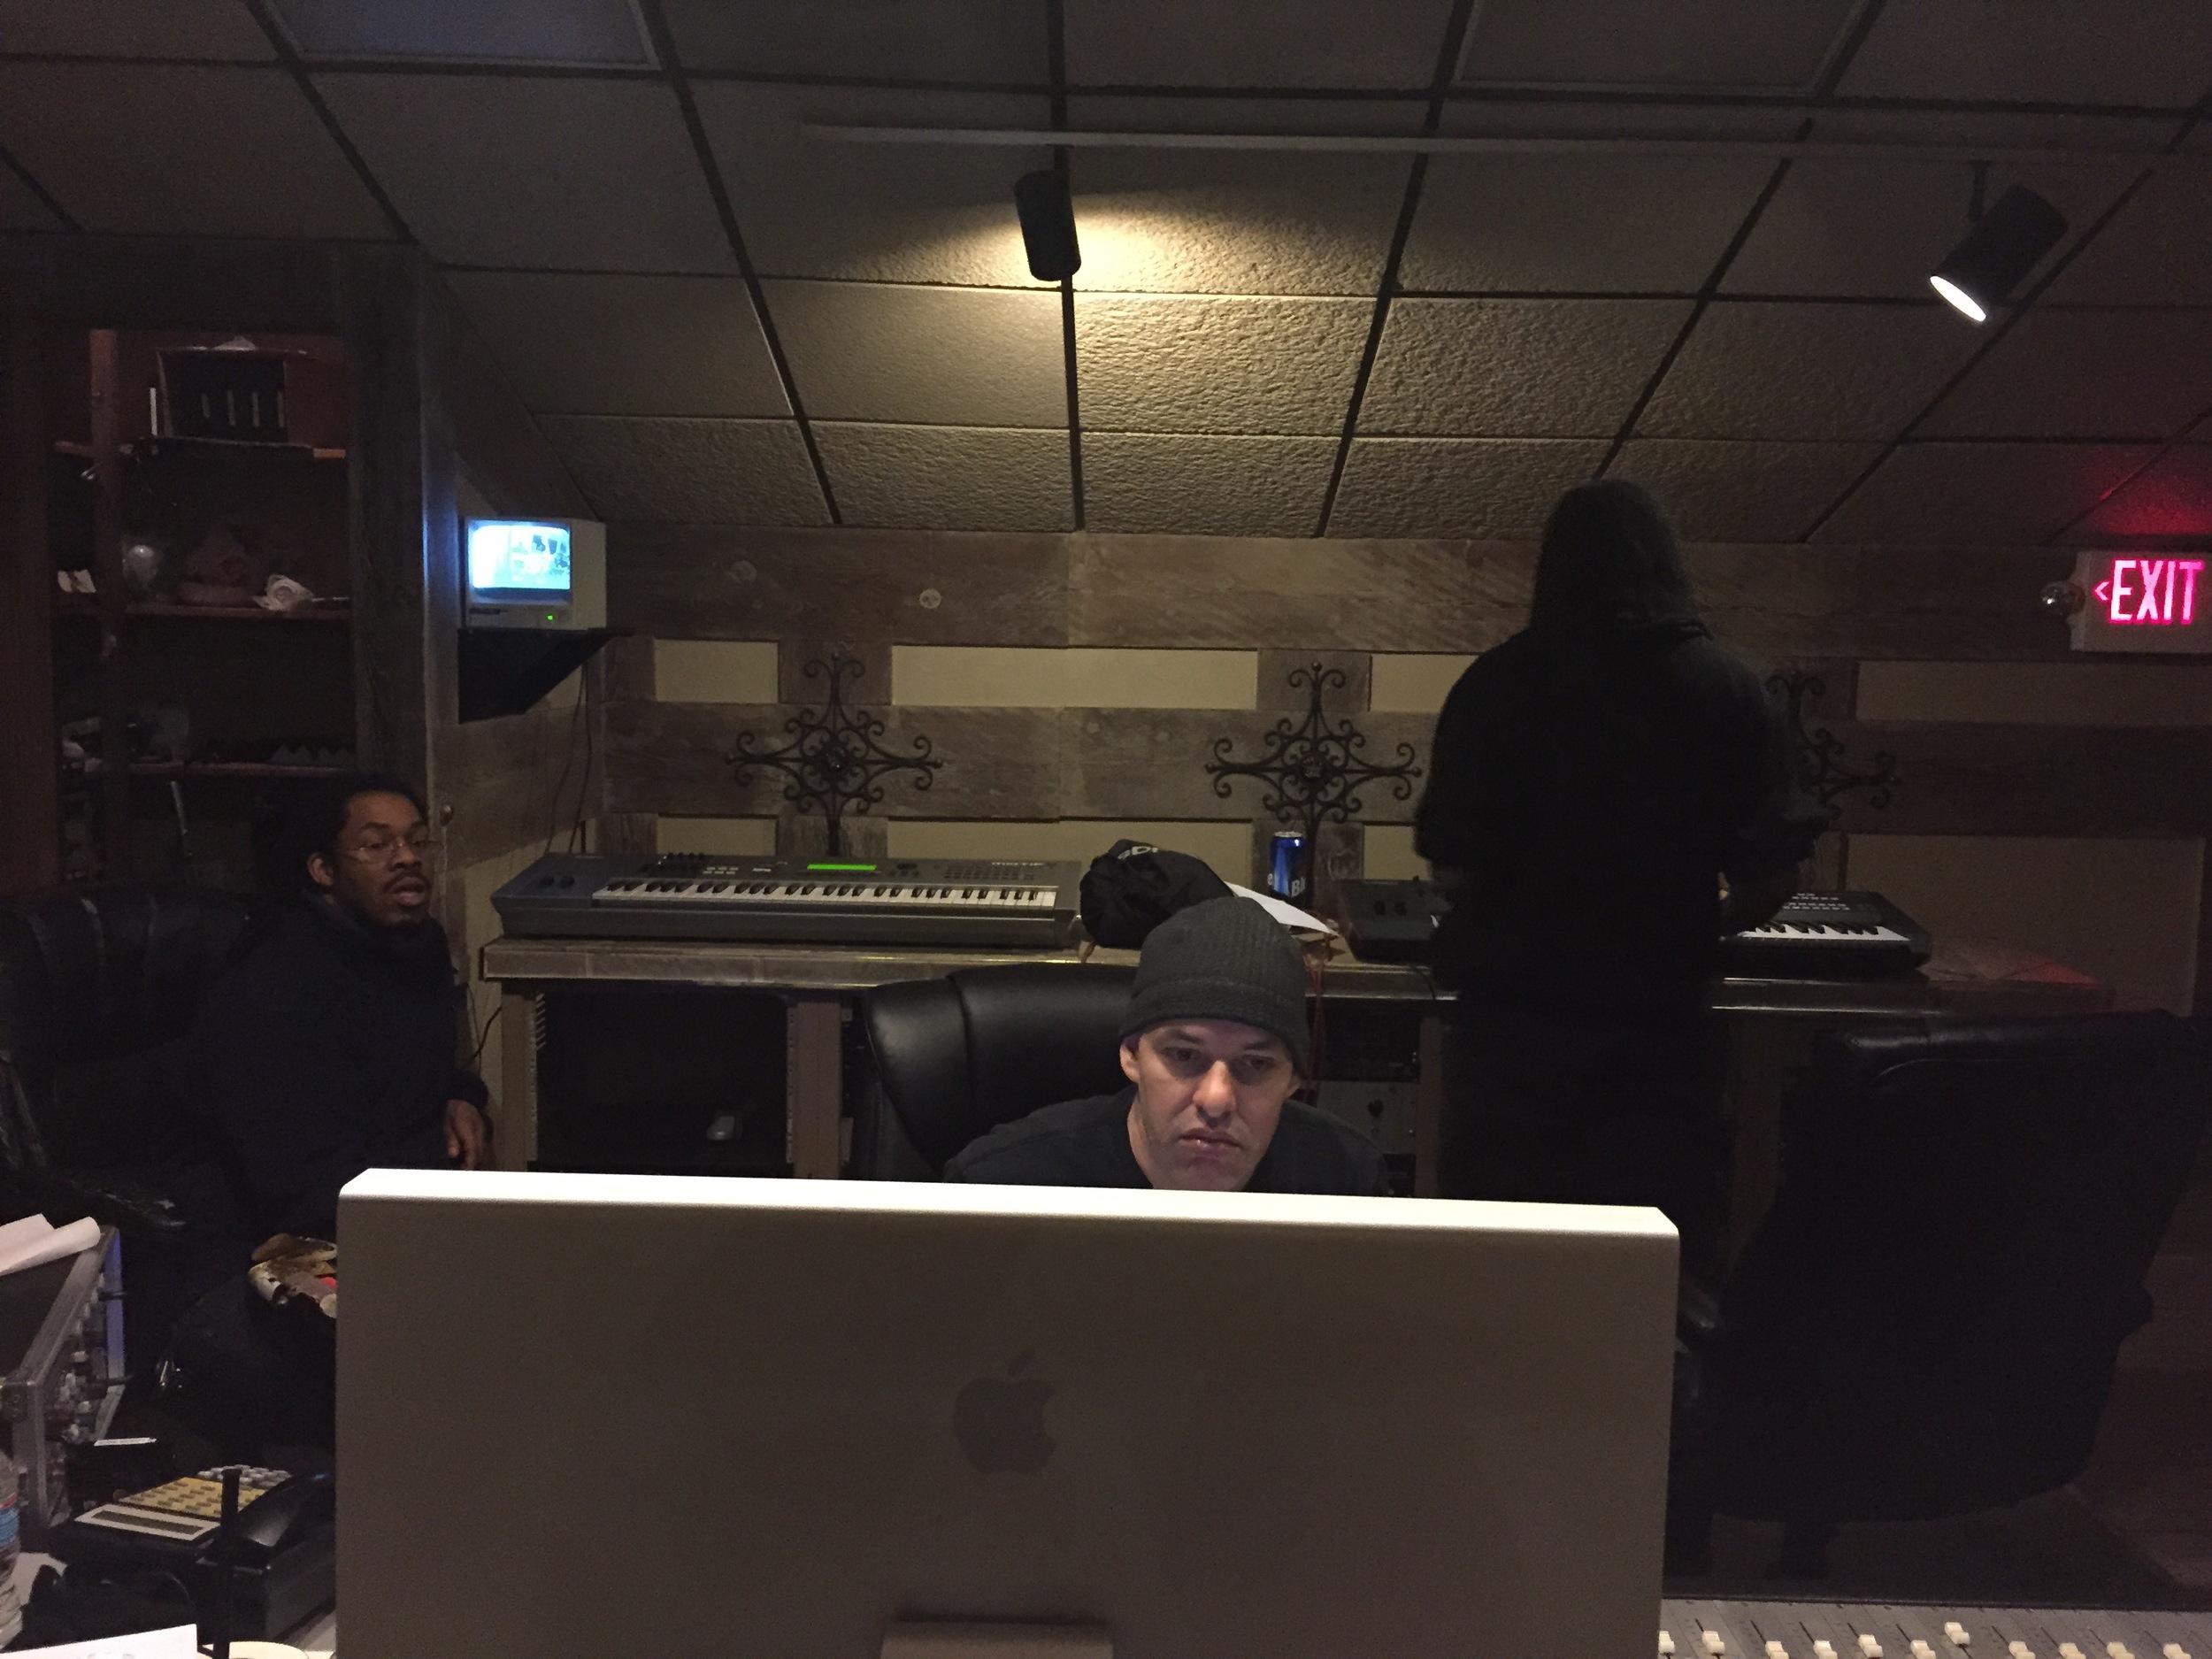 #studioflow